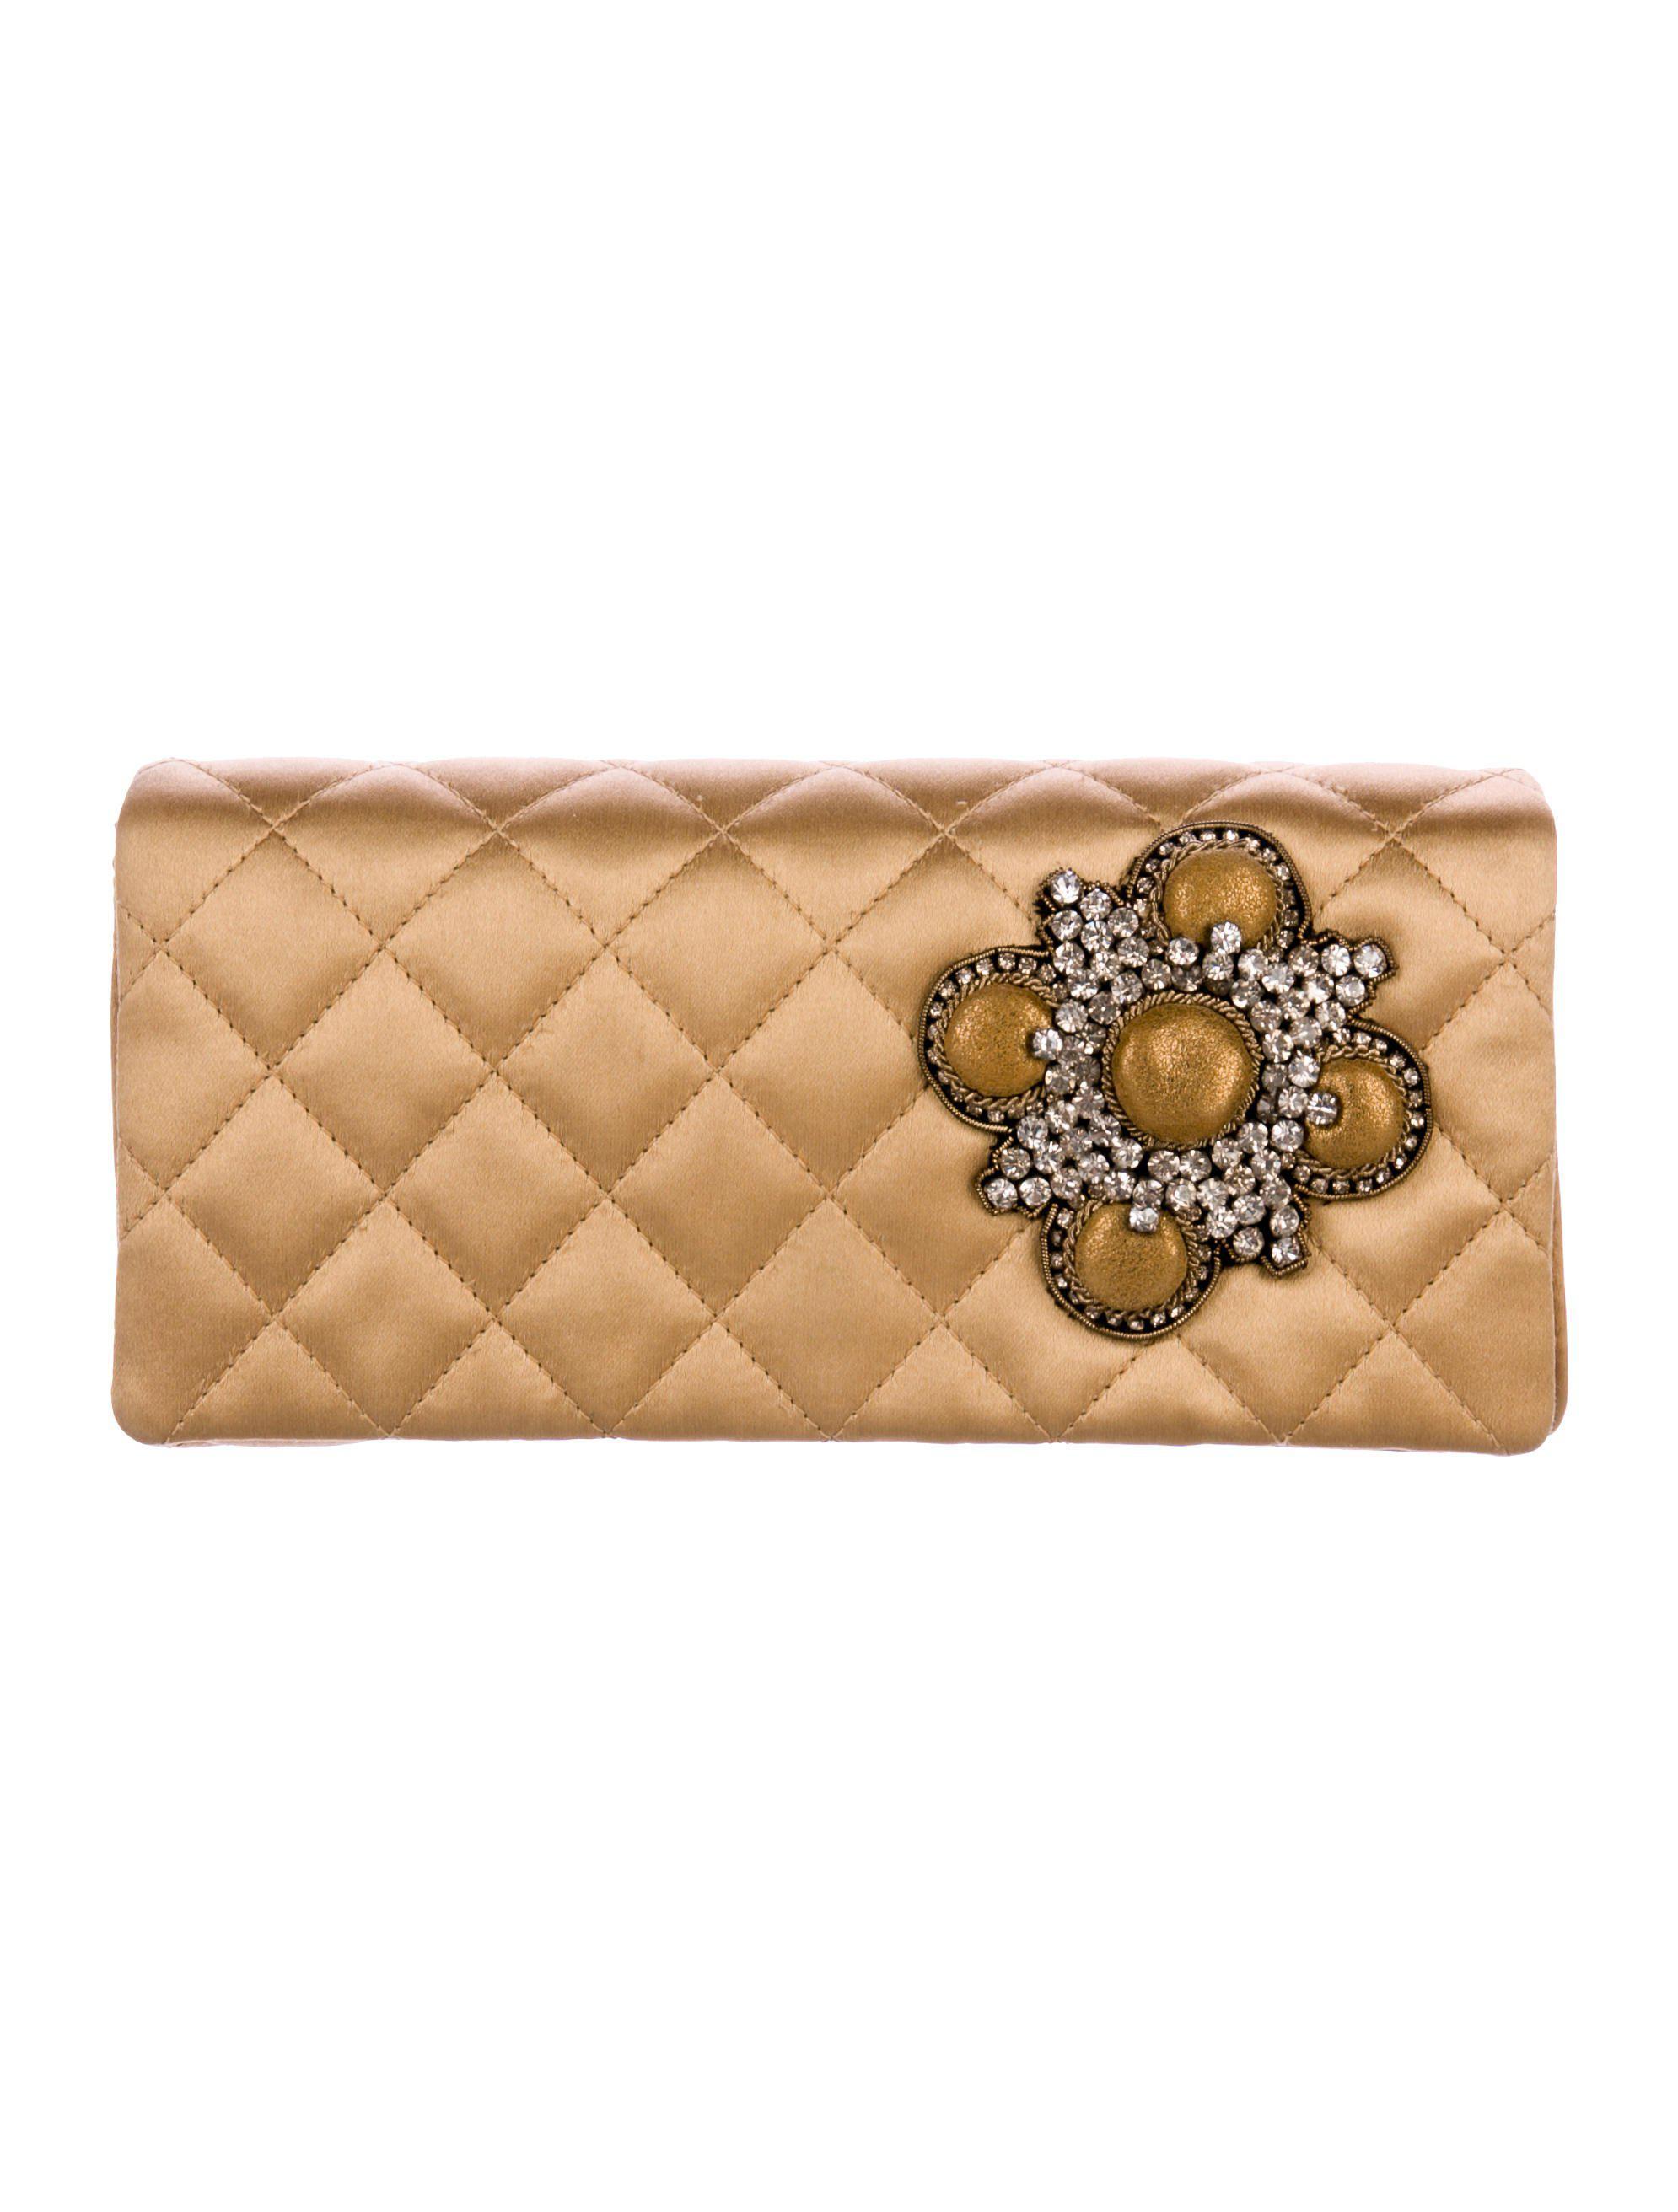 66b7008362c0 Lyst - Chanel Embellished Satin Clutch Gold in Metallic